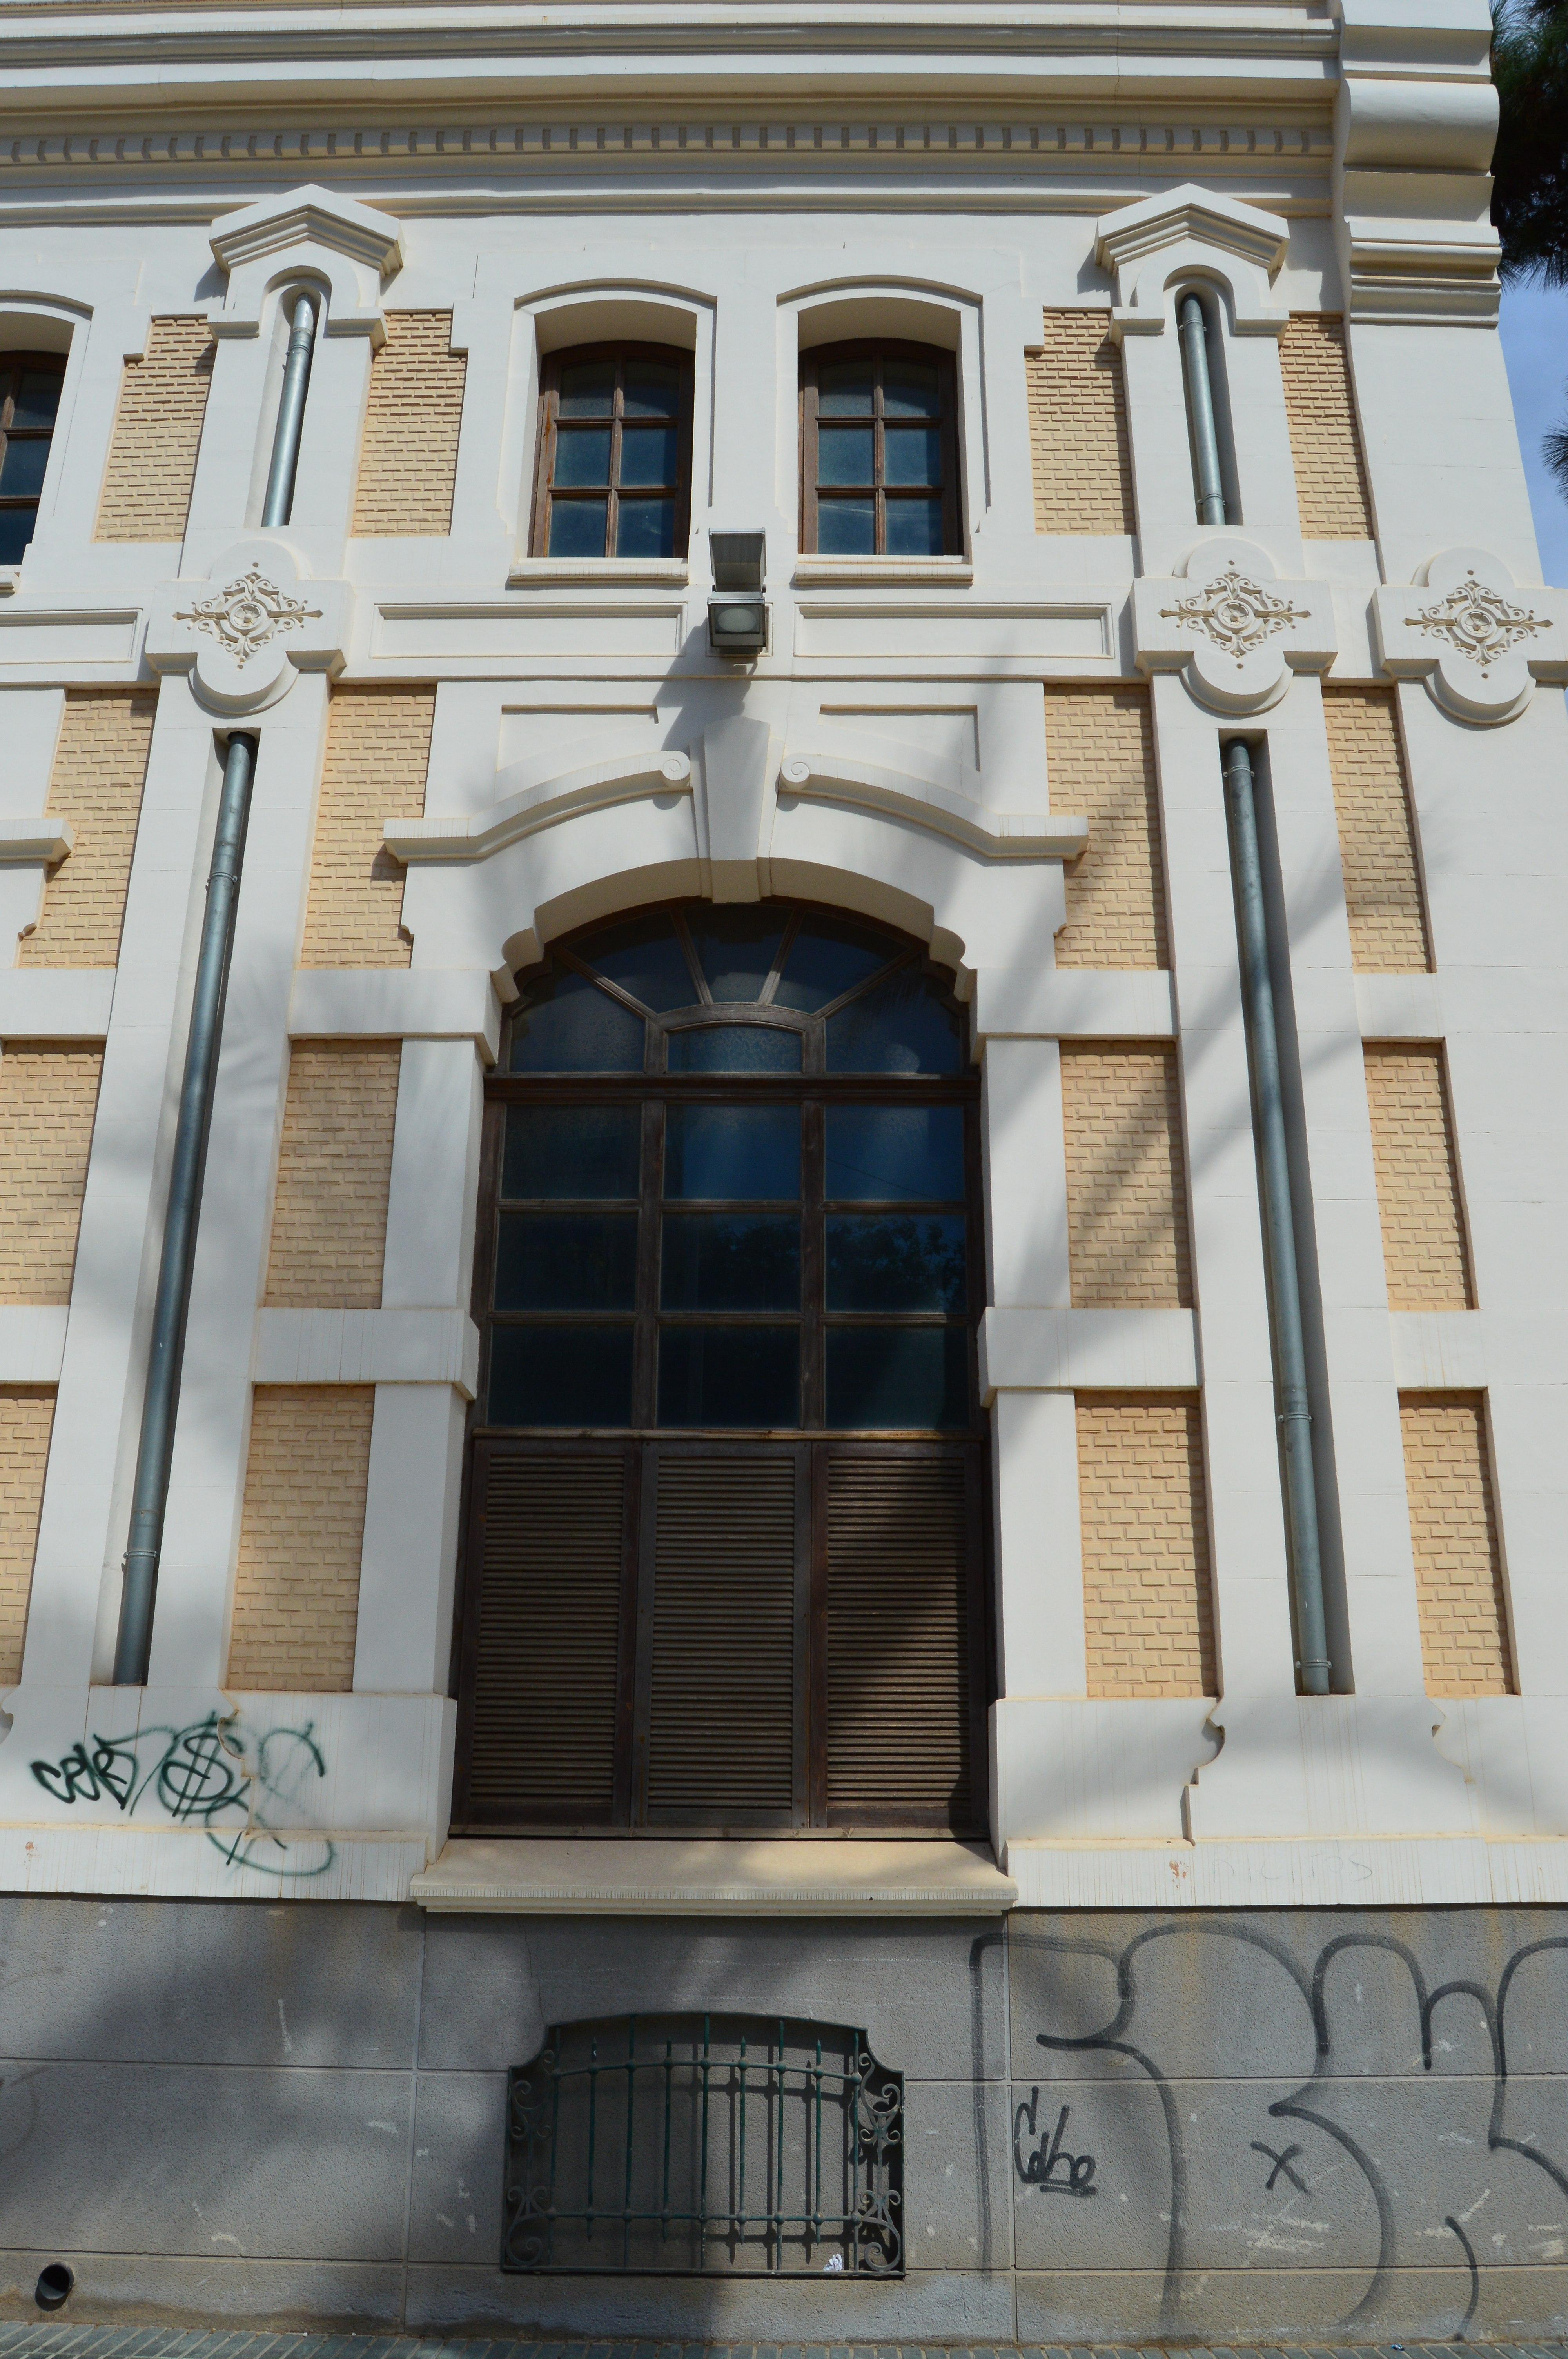 File:Detalle de una ventana de la cara oeste de la Fábrica de Fluido ...